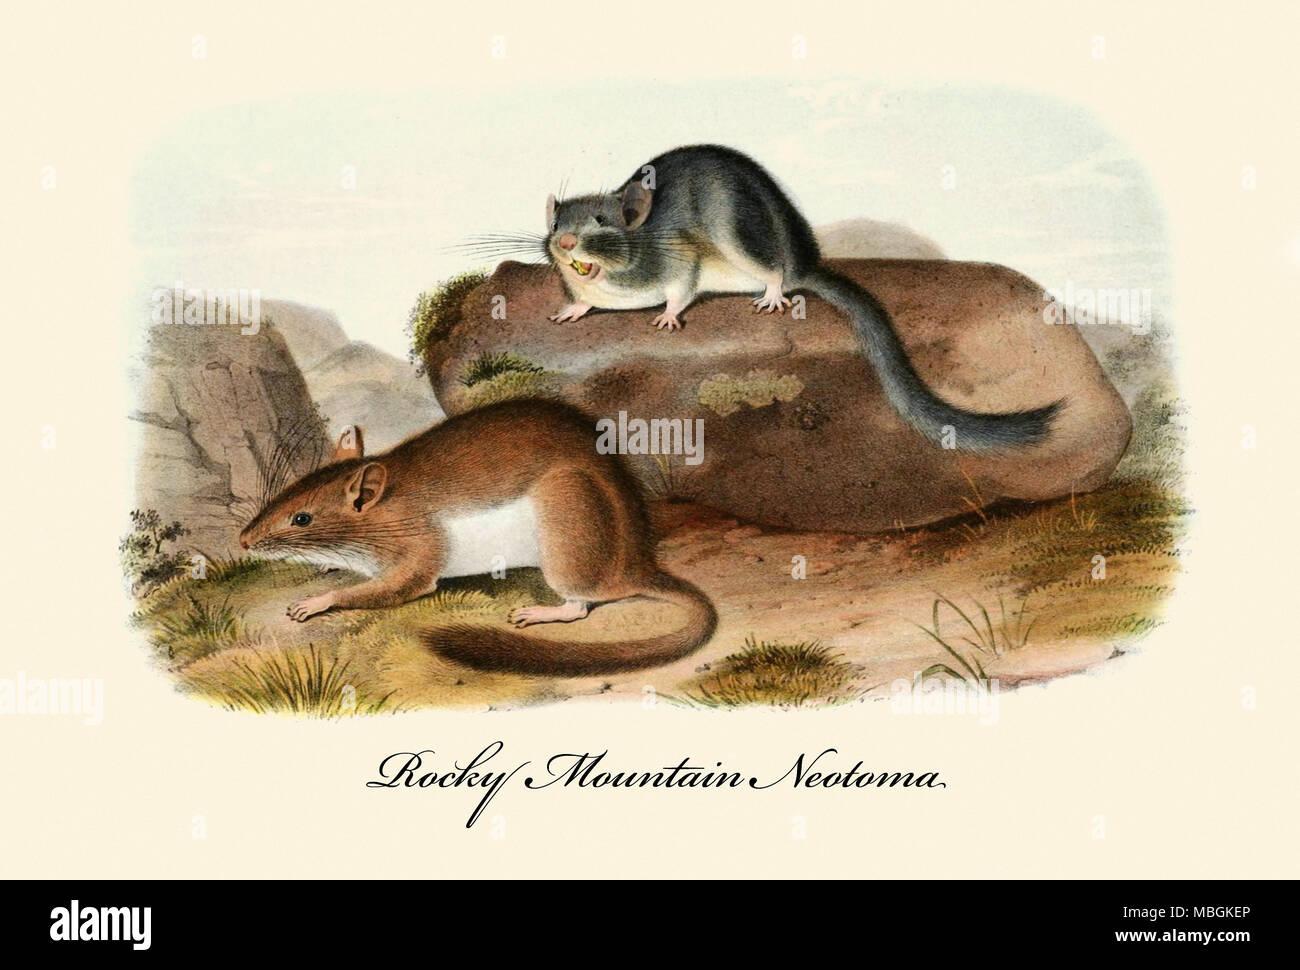 Rocky Mountain Neotoma Immagini Stock